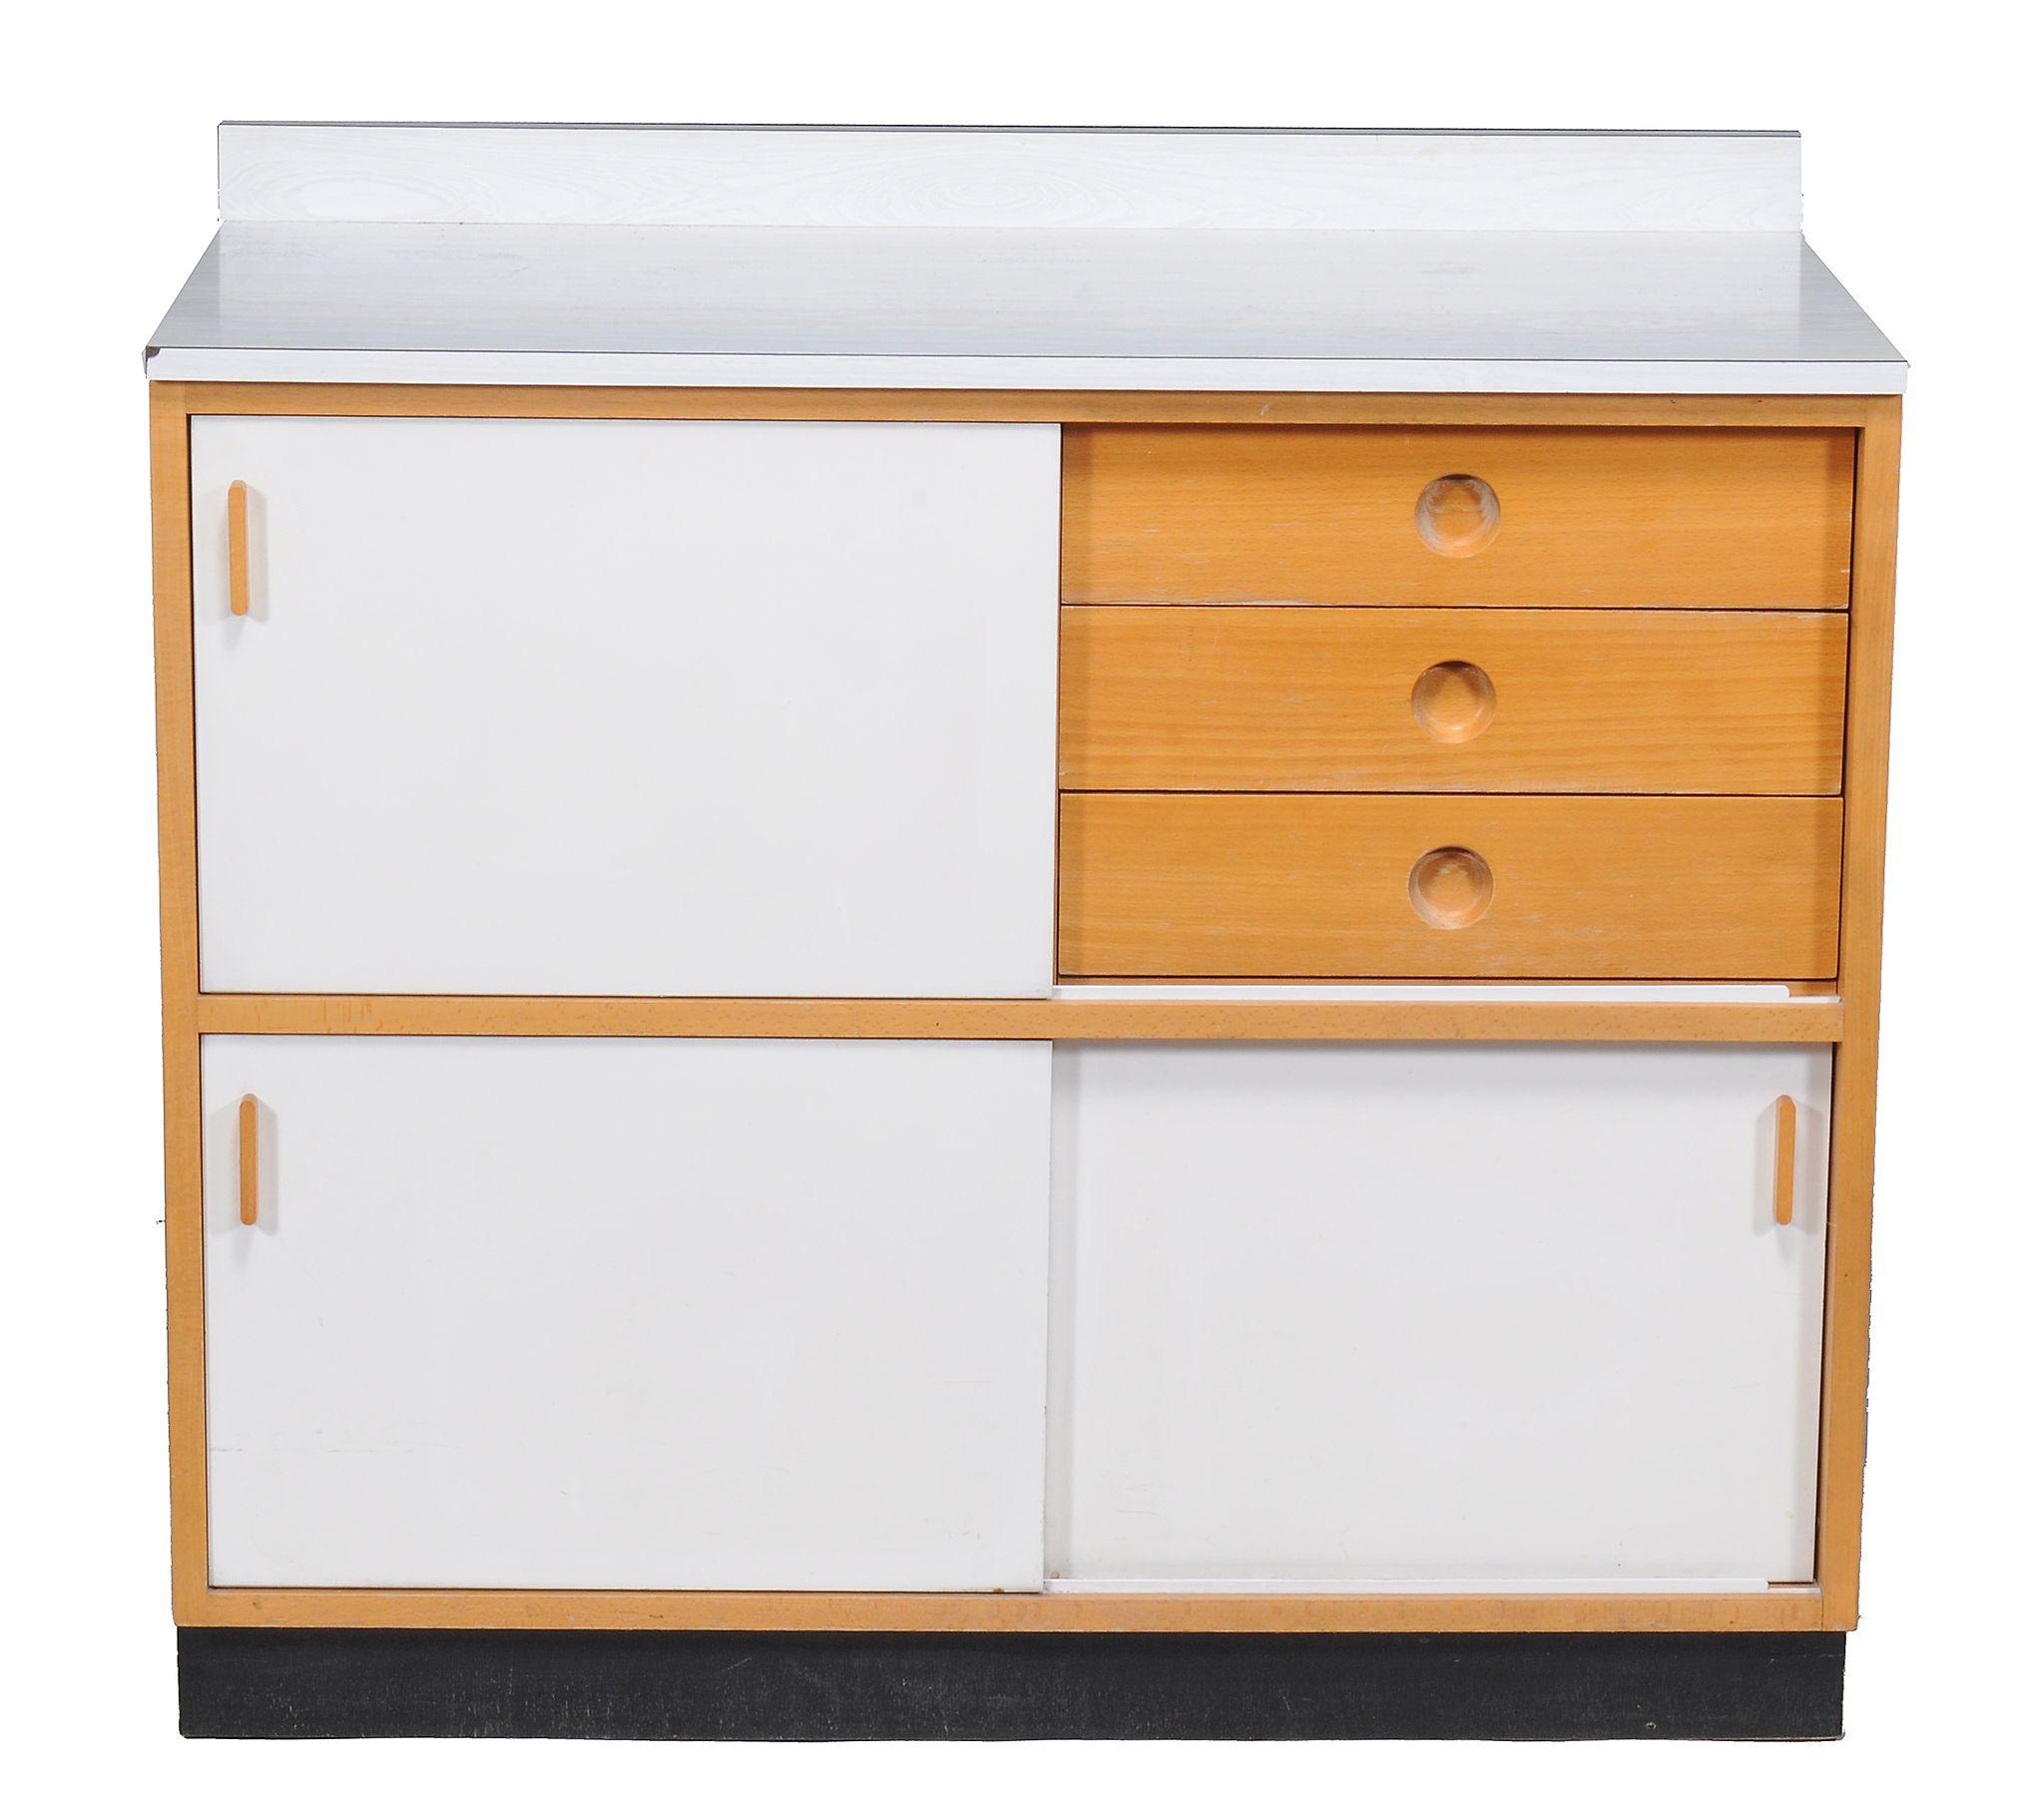 C Kitchens Ltd: Frank Guille For Kandya Ltd, Trimma Kitchen Cabinets